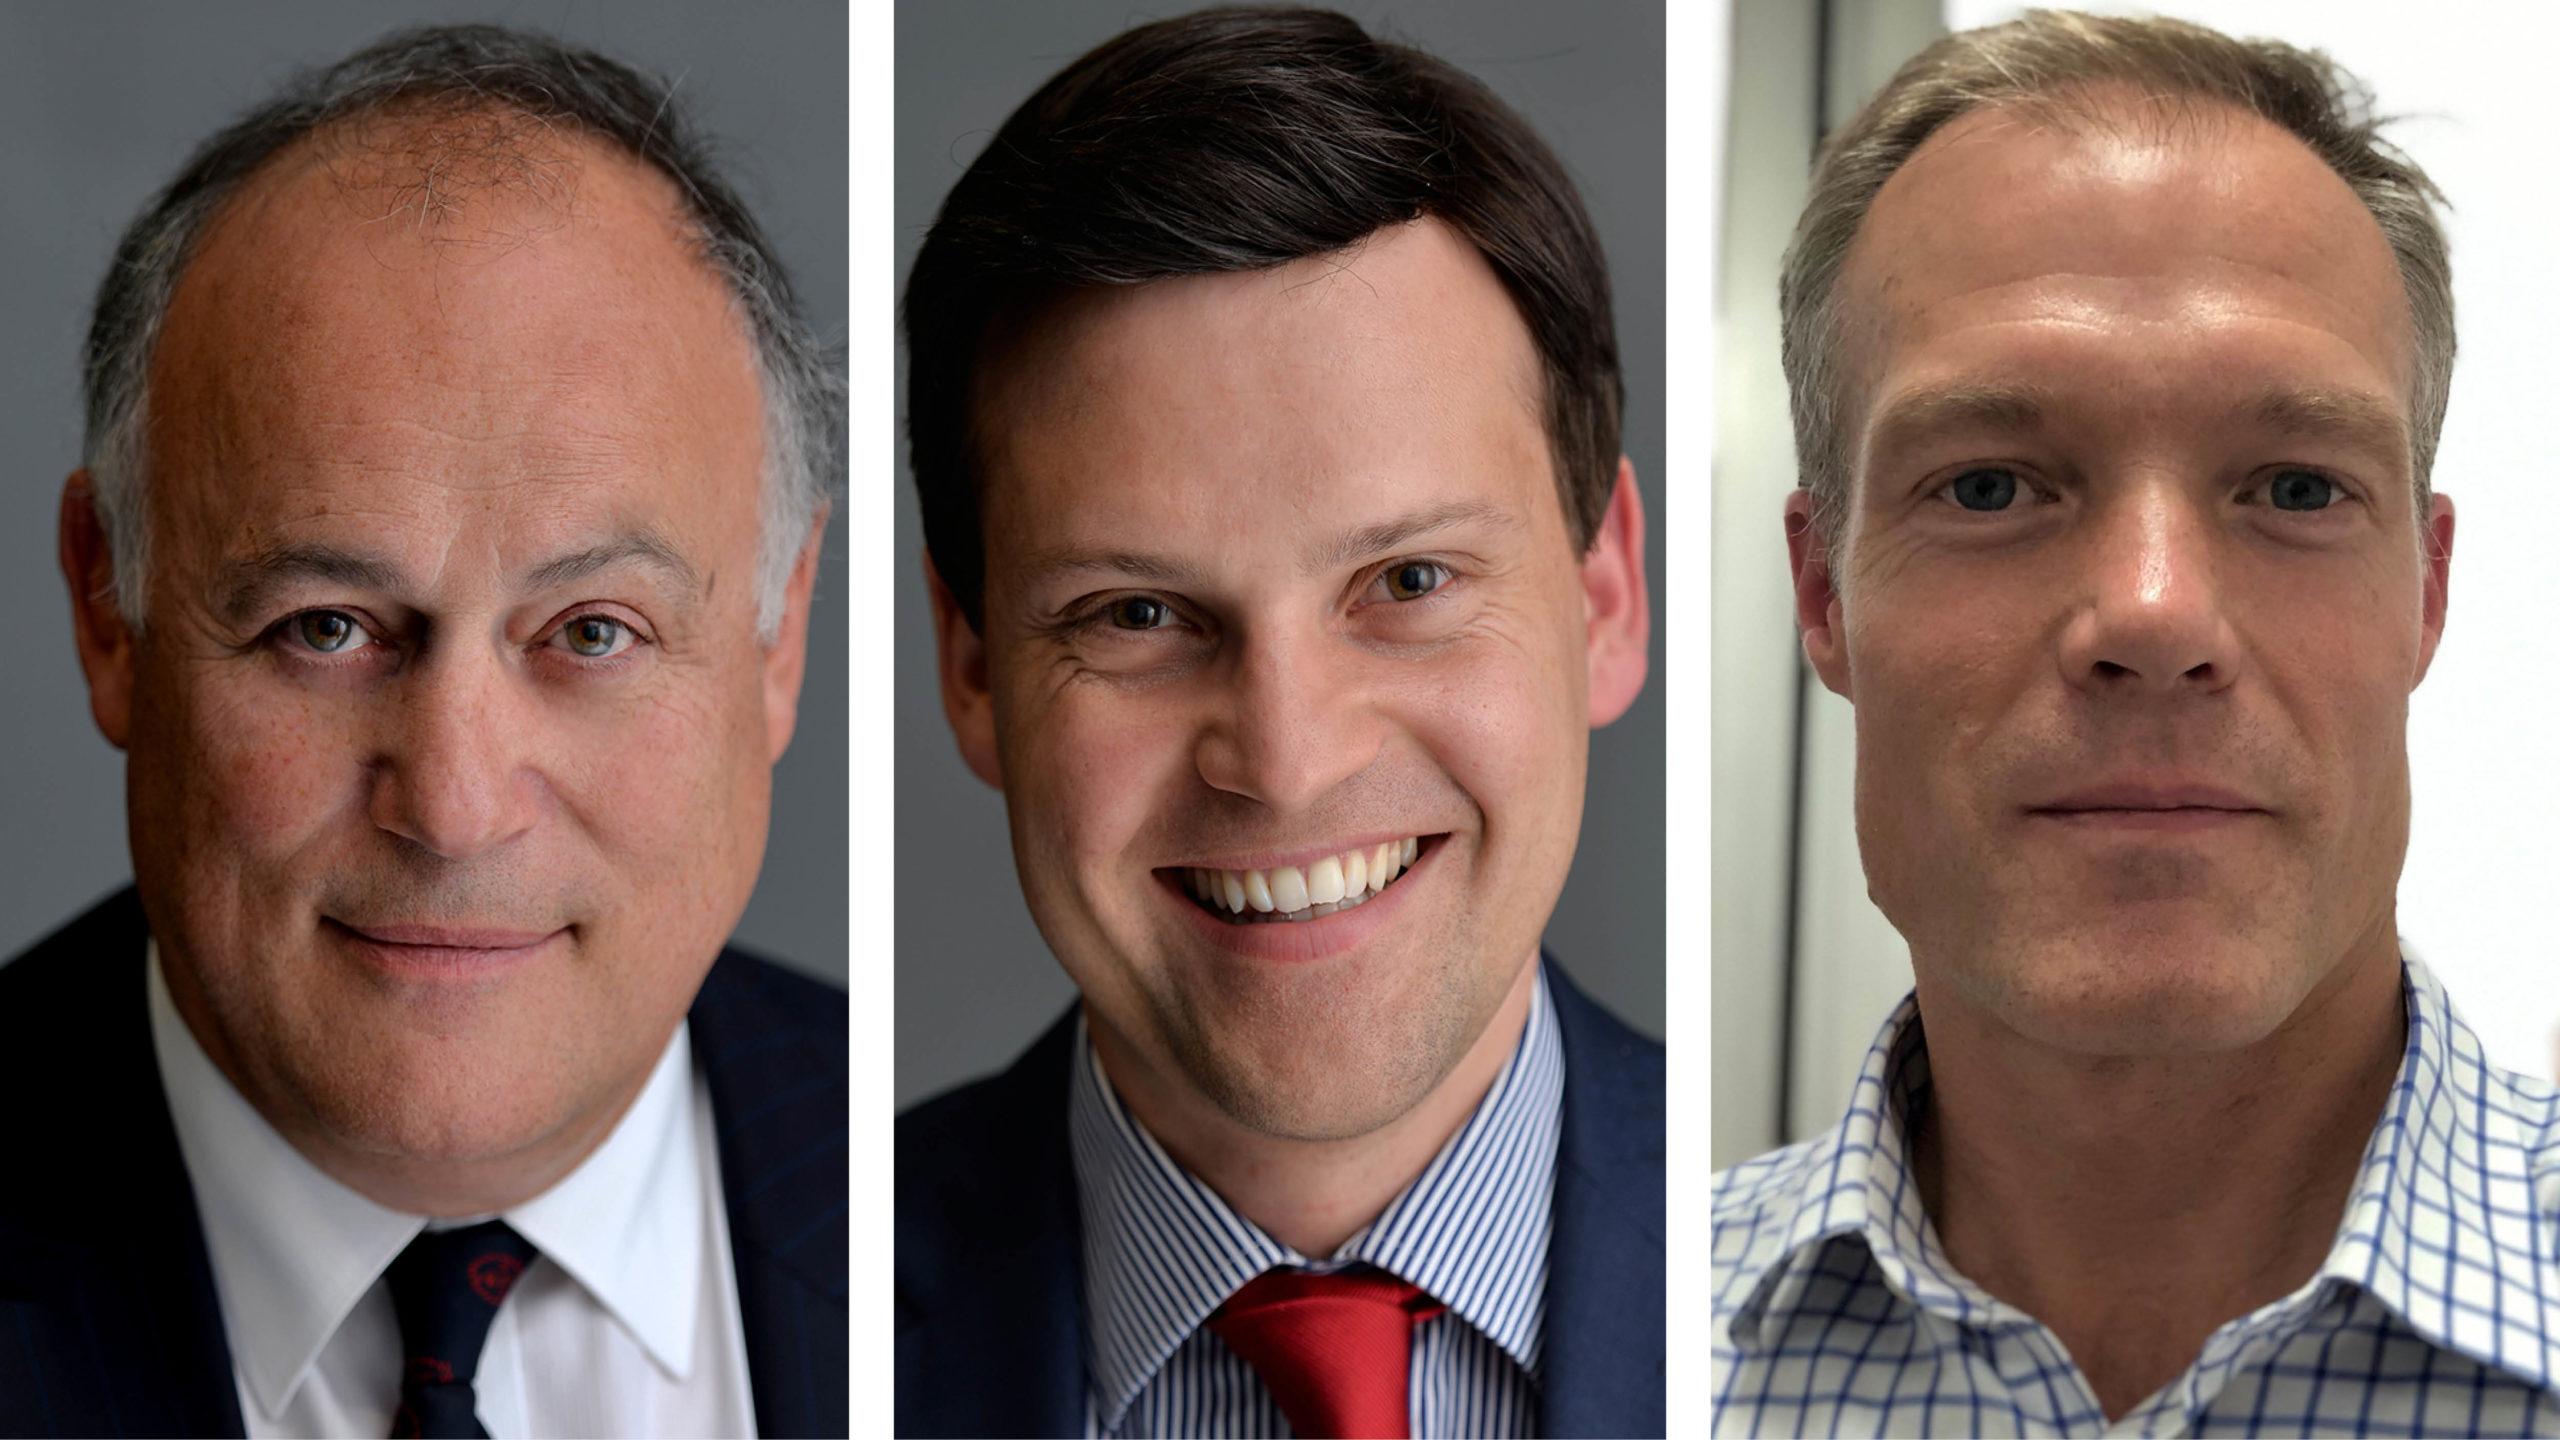 Professor Tim Briggs, John Machin and Daren Forward